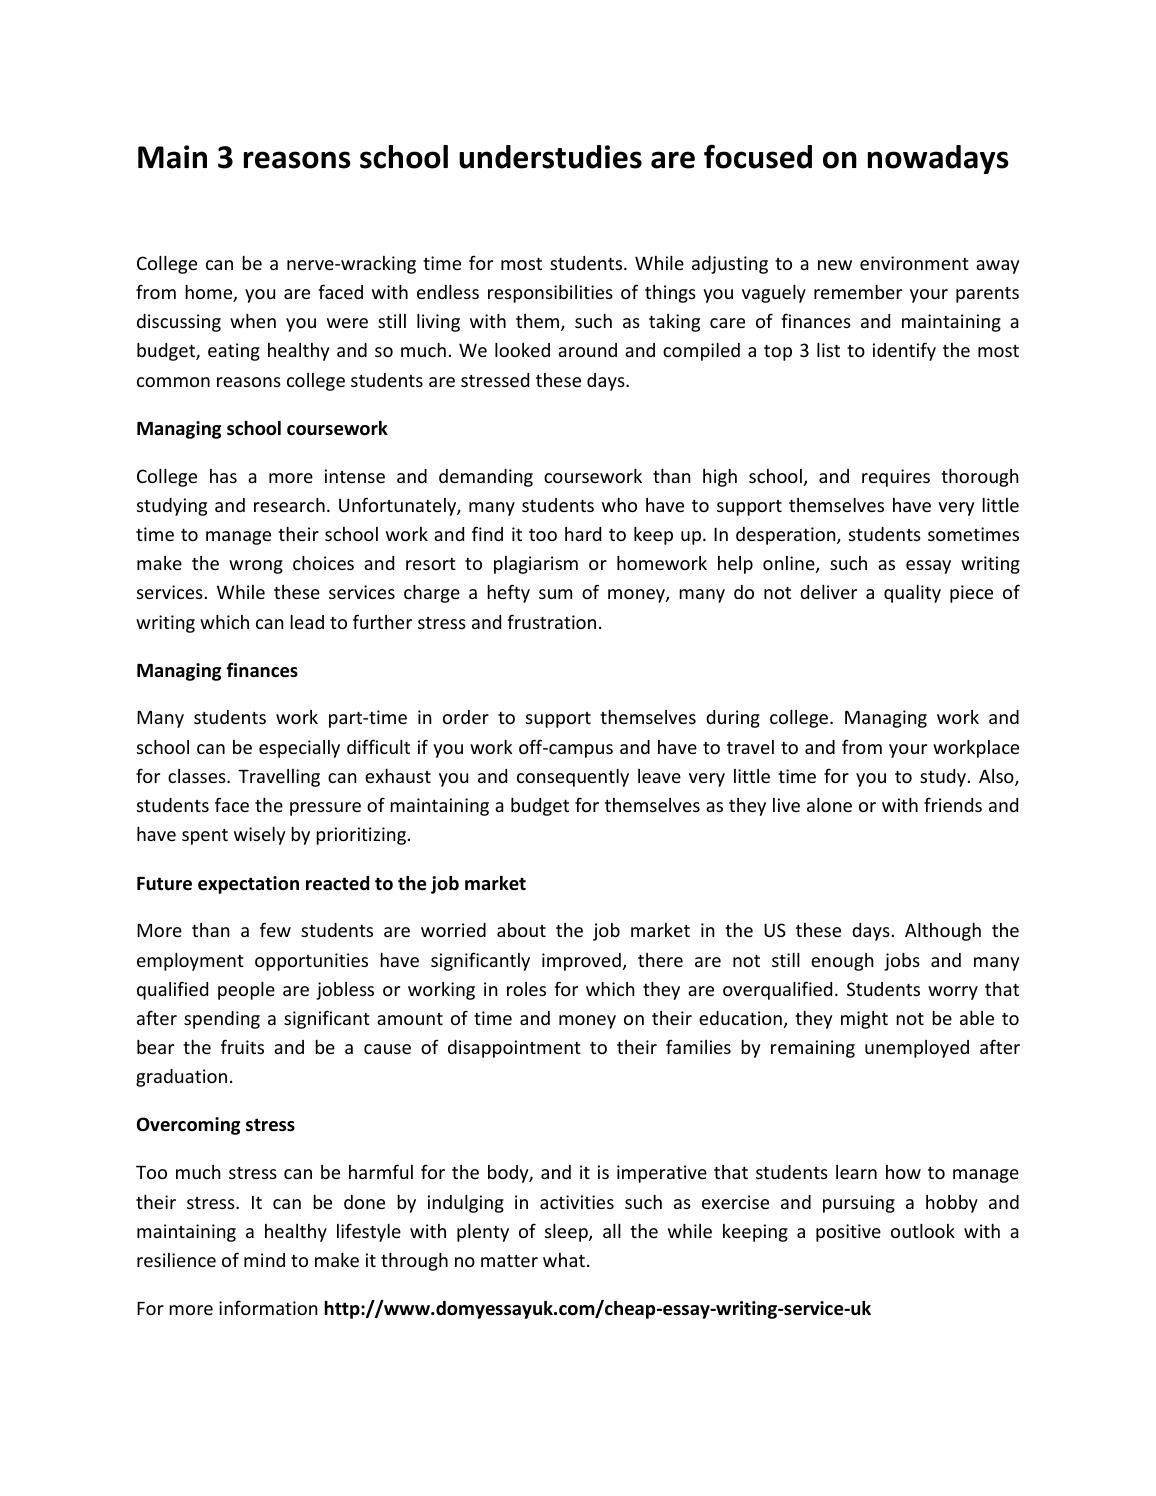 cv writing service uk